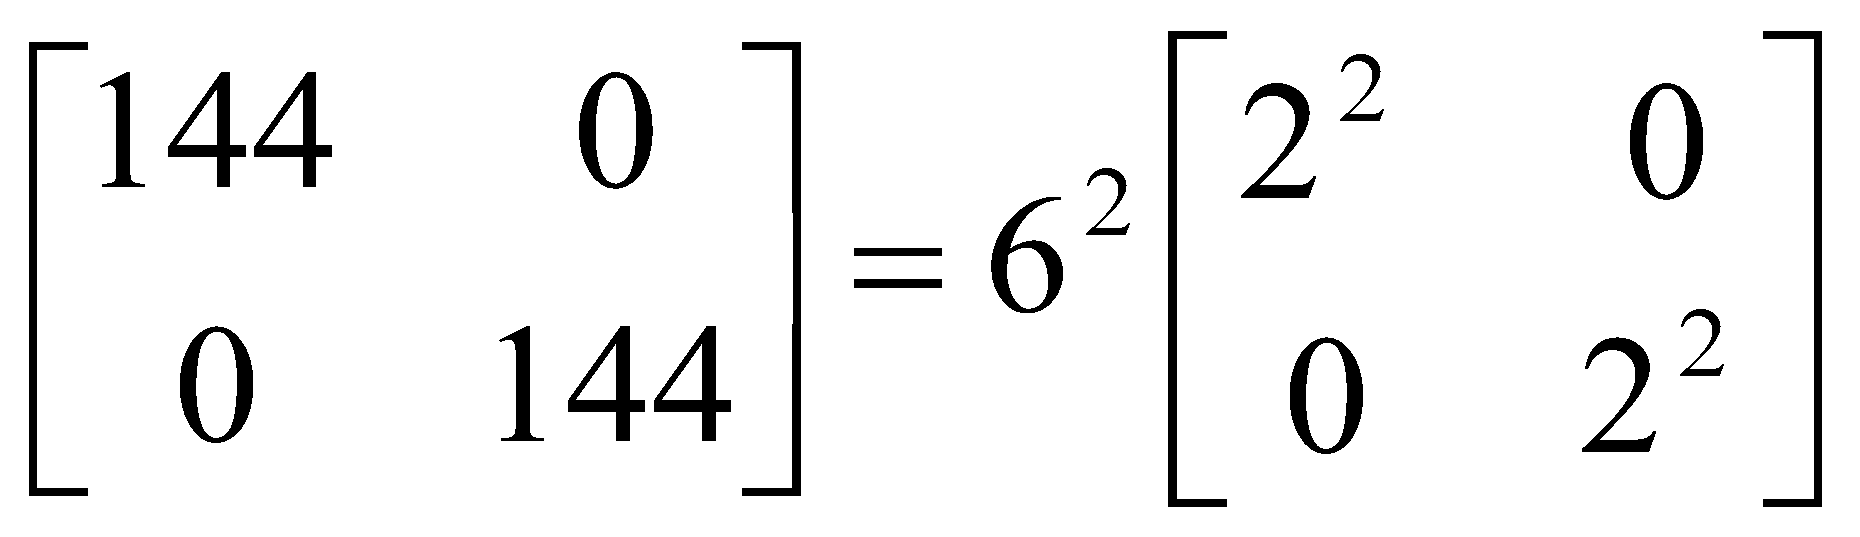 image87.png